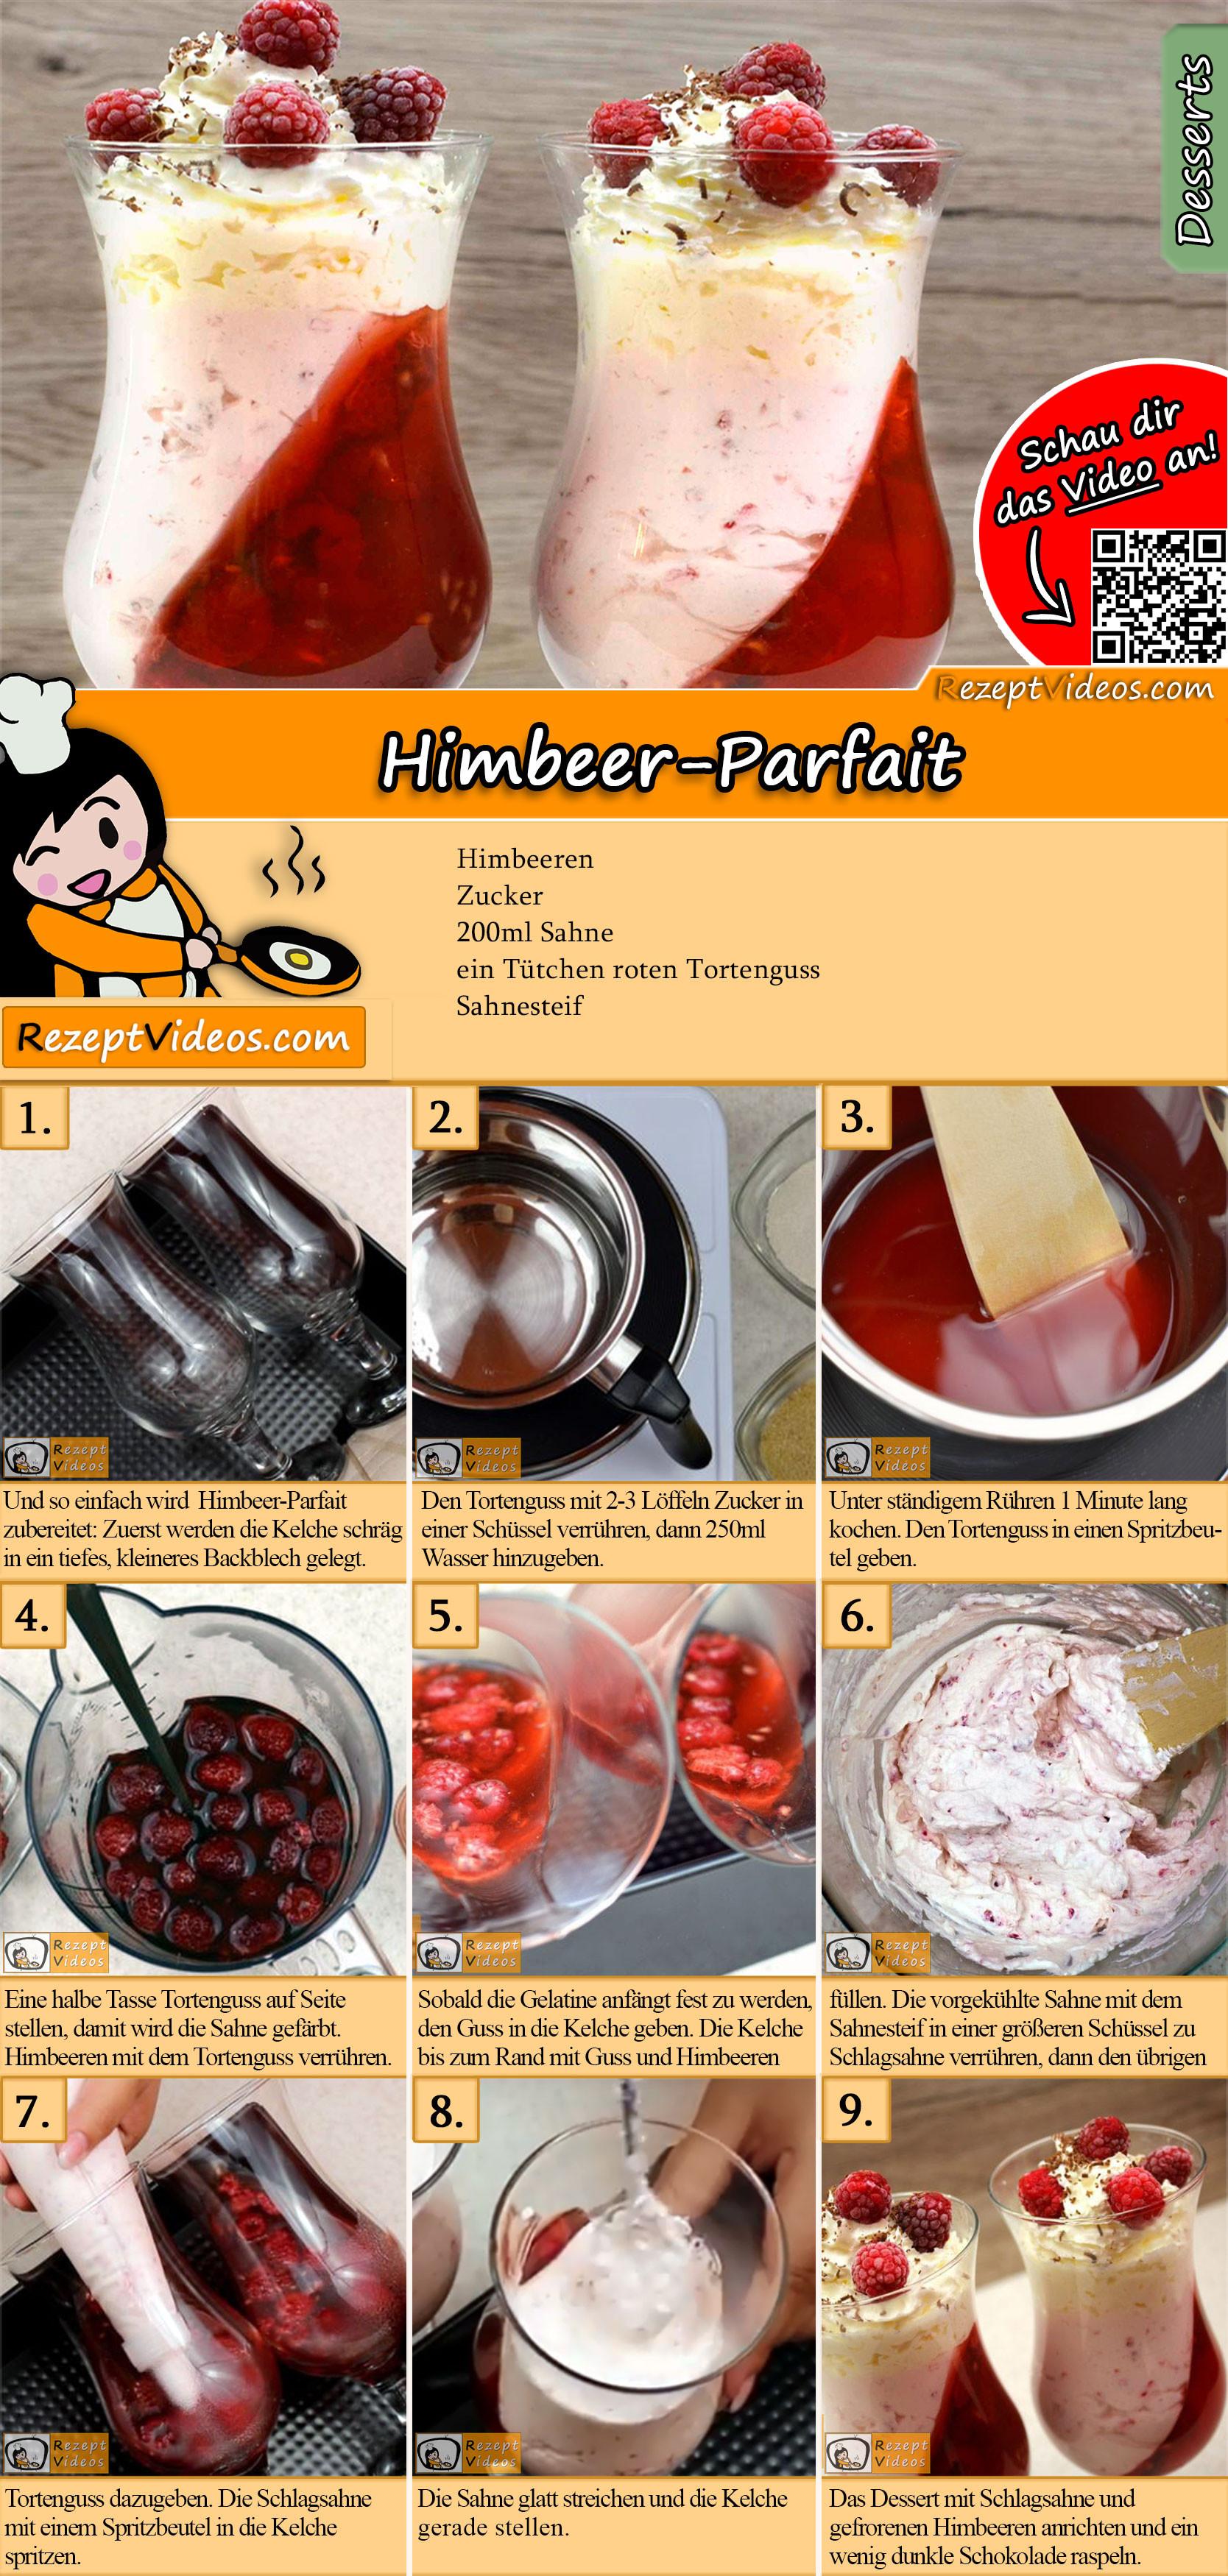 Himbeer-Parfait Rezept mit Video